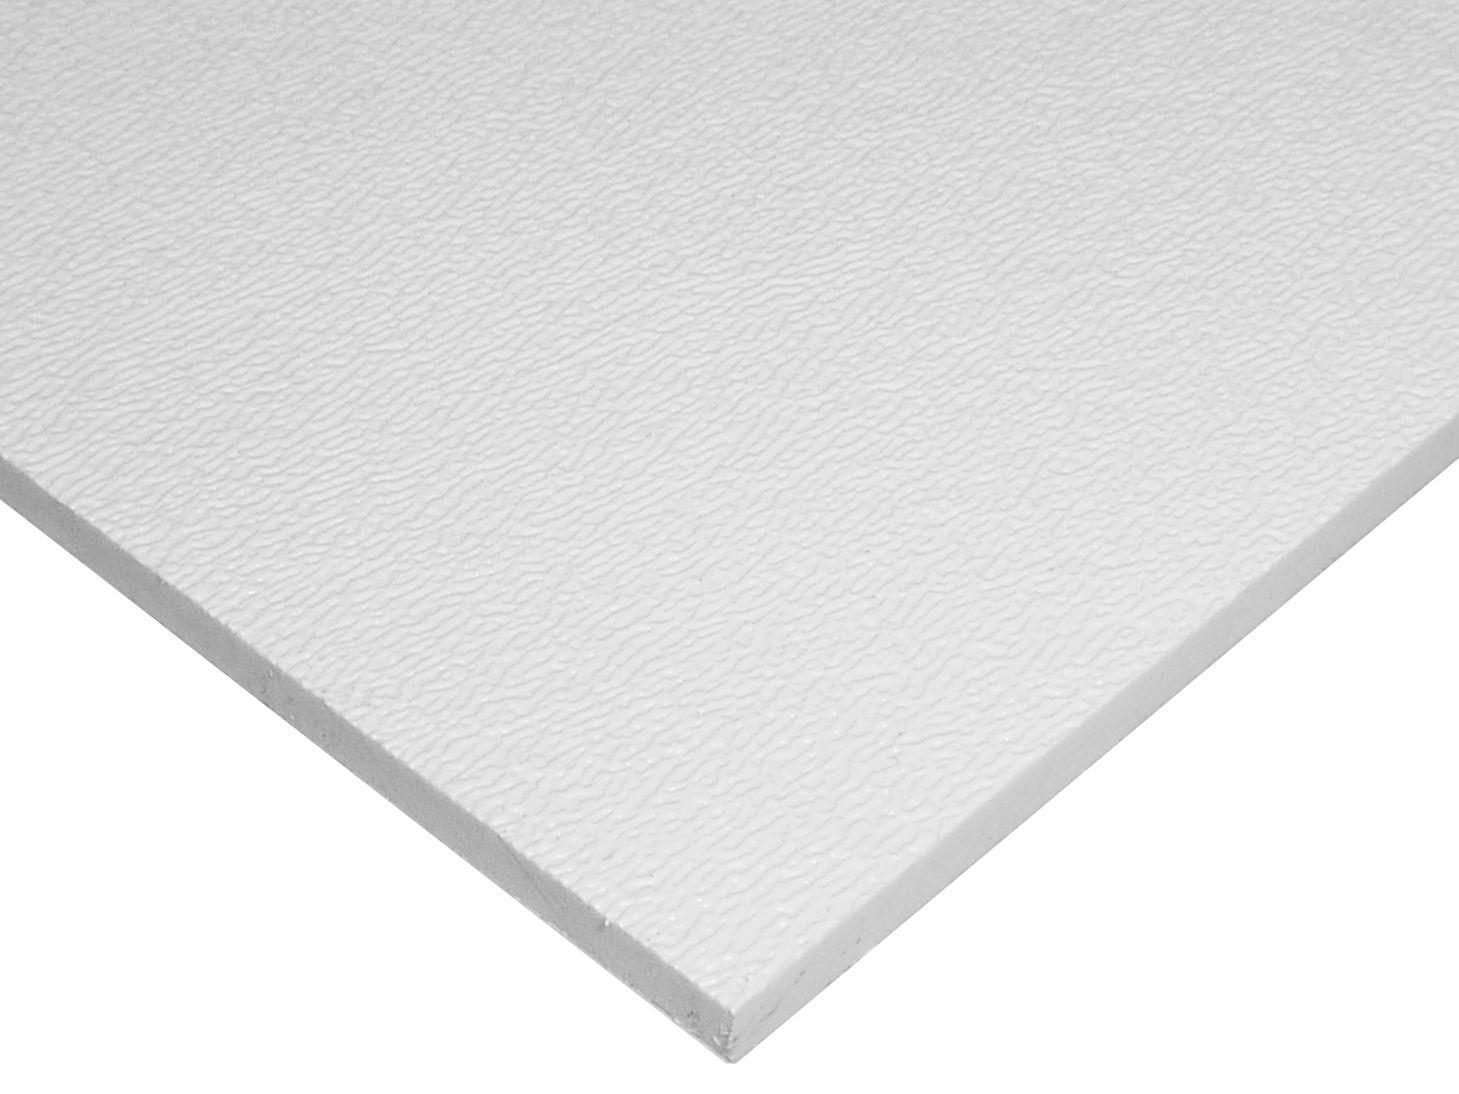 Abs Sheet Natural Machine Grade Extrude Plastic Sheets Sheet